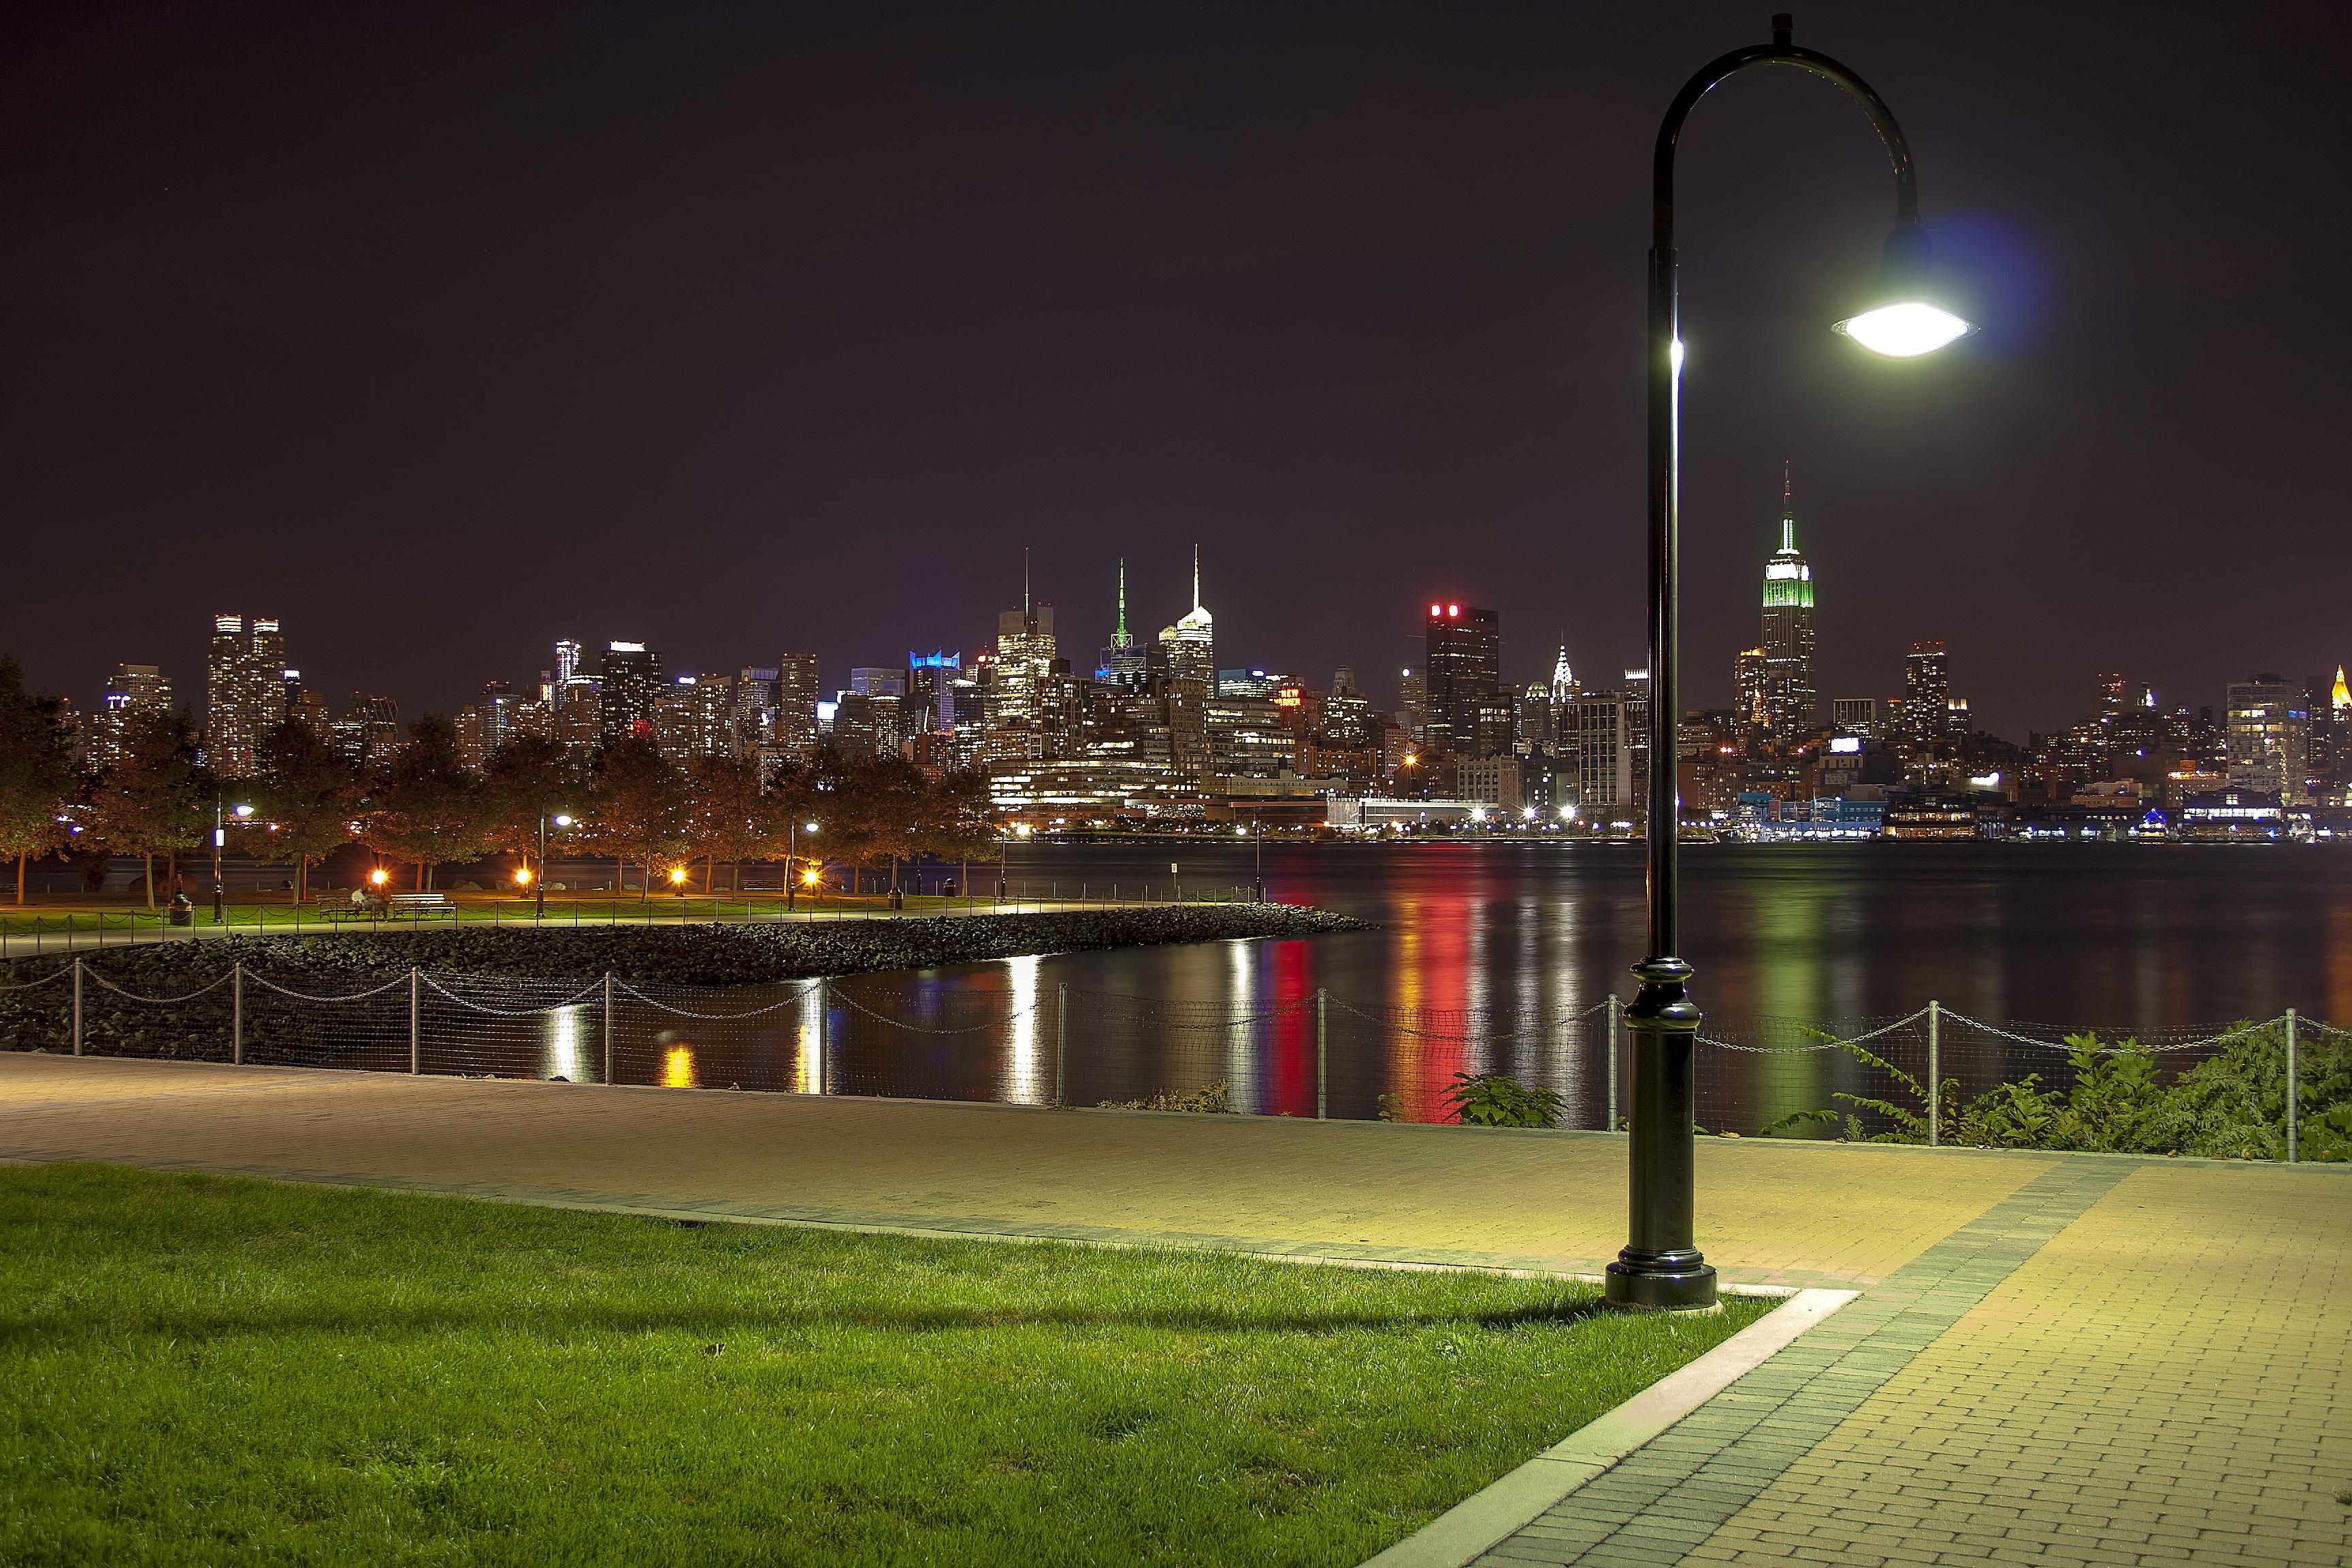 Free Images : Water, Horizon, Architecture, Bridge, Building, Skyscraper, New  York, River, Manhattan, New York City, Cityscape, Downtown, Travel, Dusk,  ...